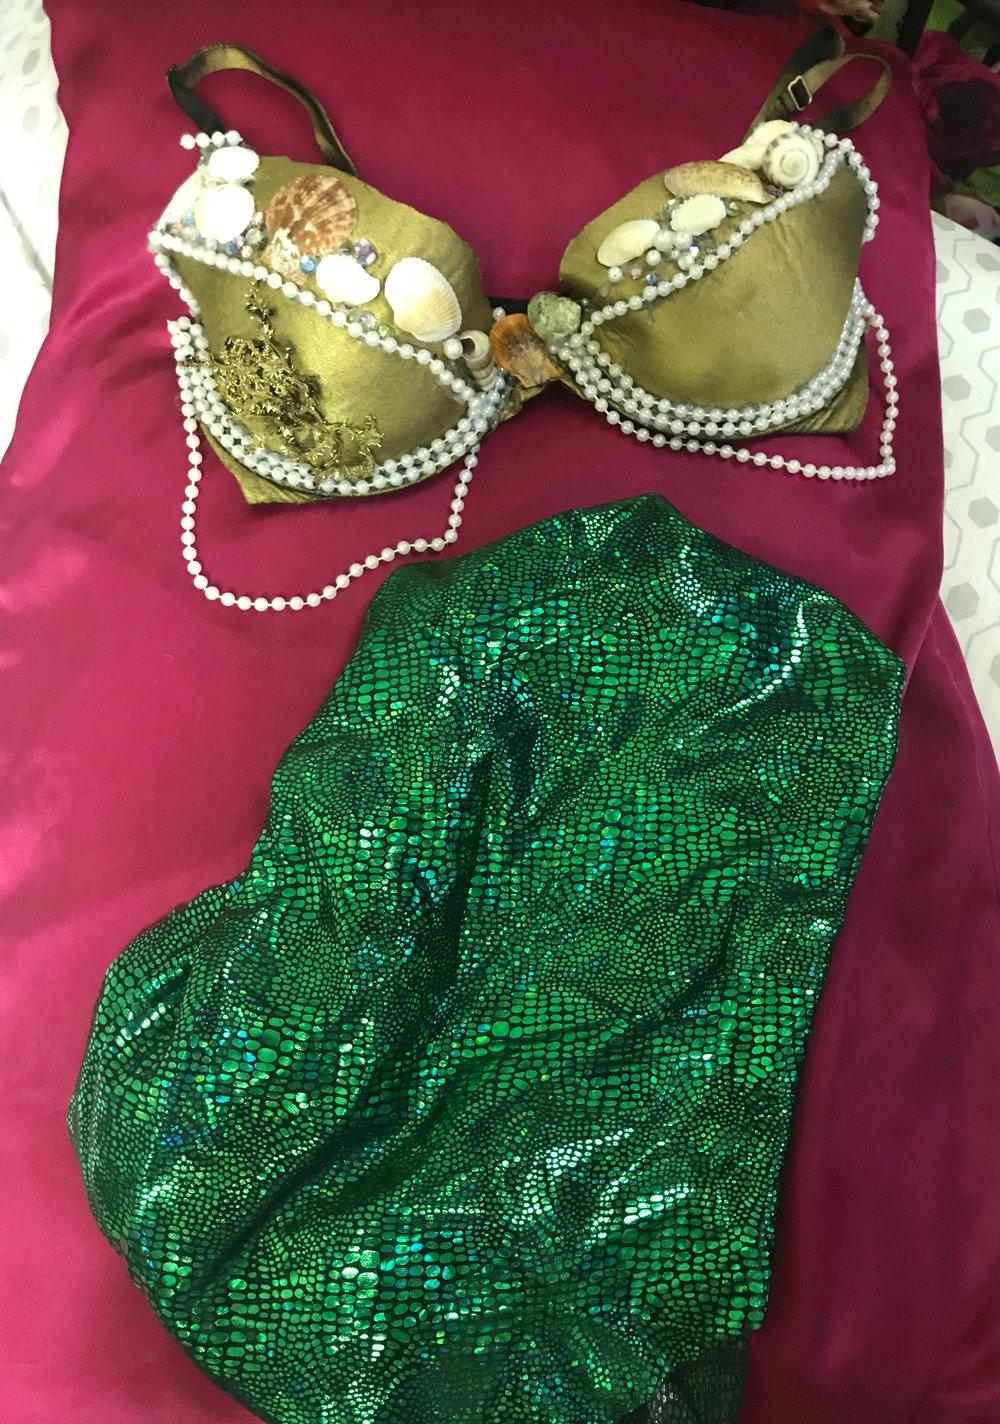 Slaytober Diy Halloween Costume Mermaid Babe Well With Brielle